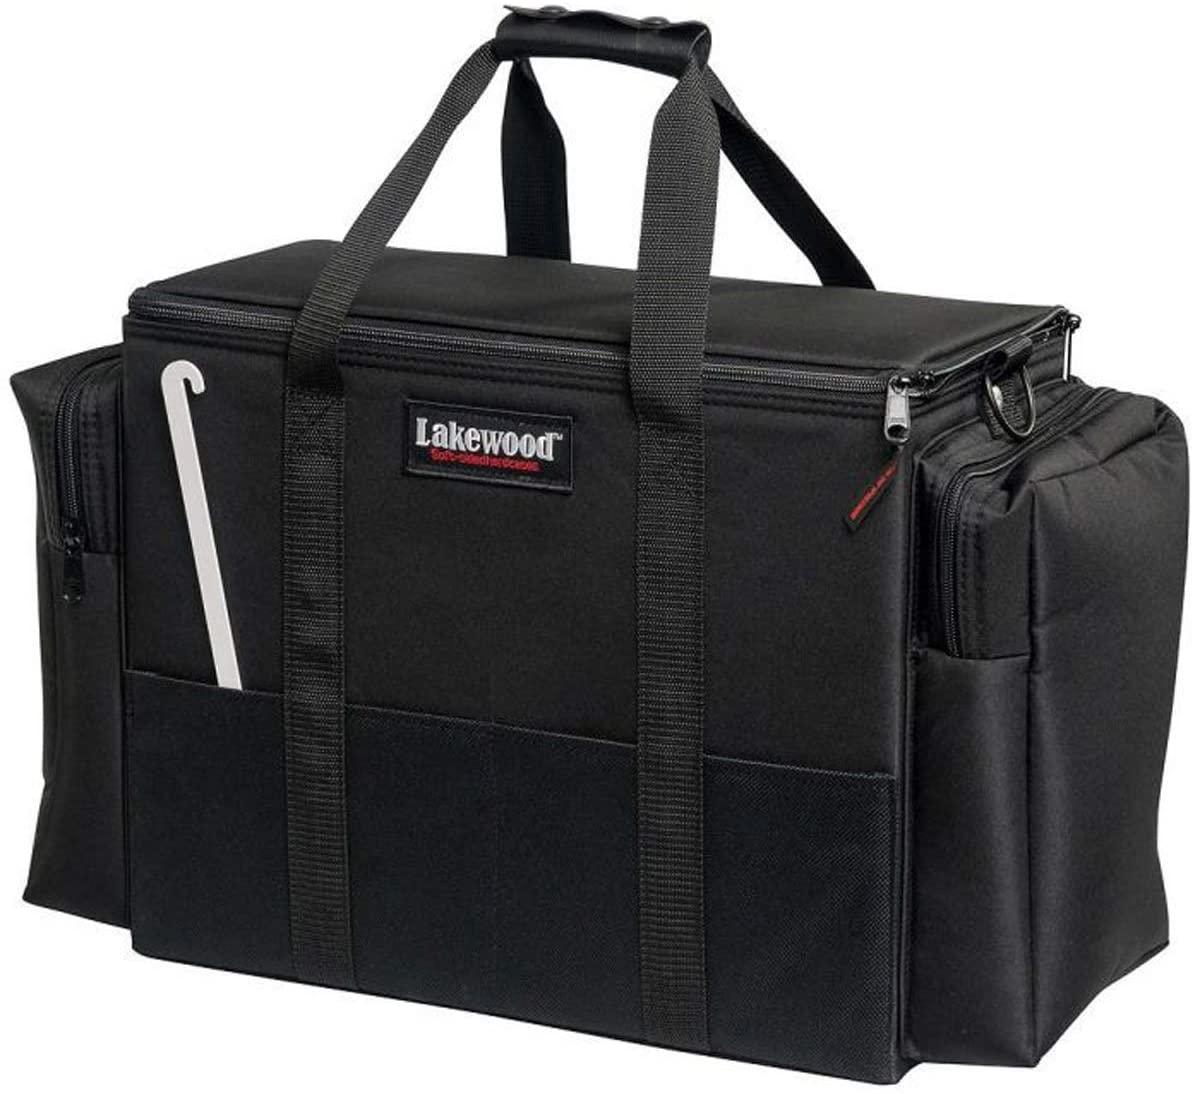 Lakewood Musky Upright Tackle Box